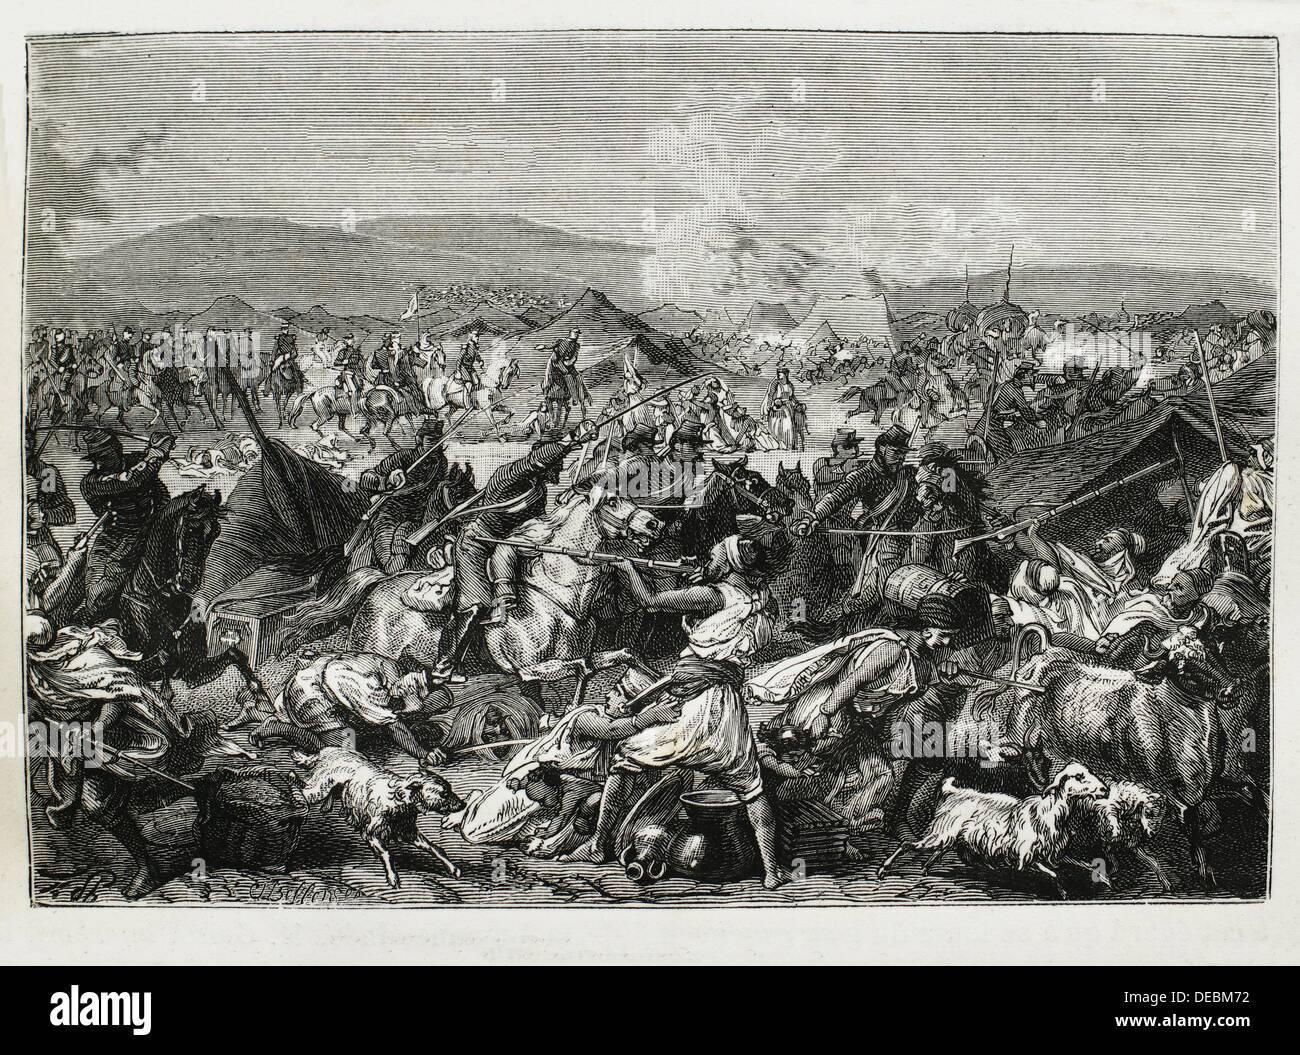 French army taking the ´smalah´ of Abd-el-Kader on 16 May 1843 at Petit-Desert, Algeria - Stock Image